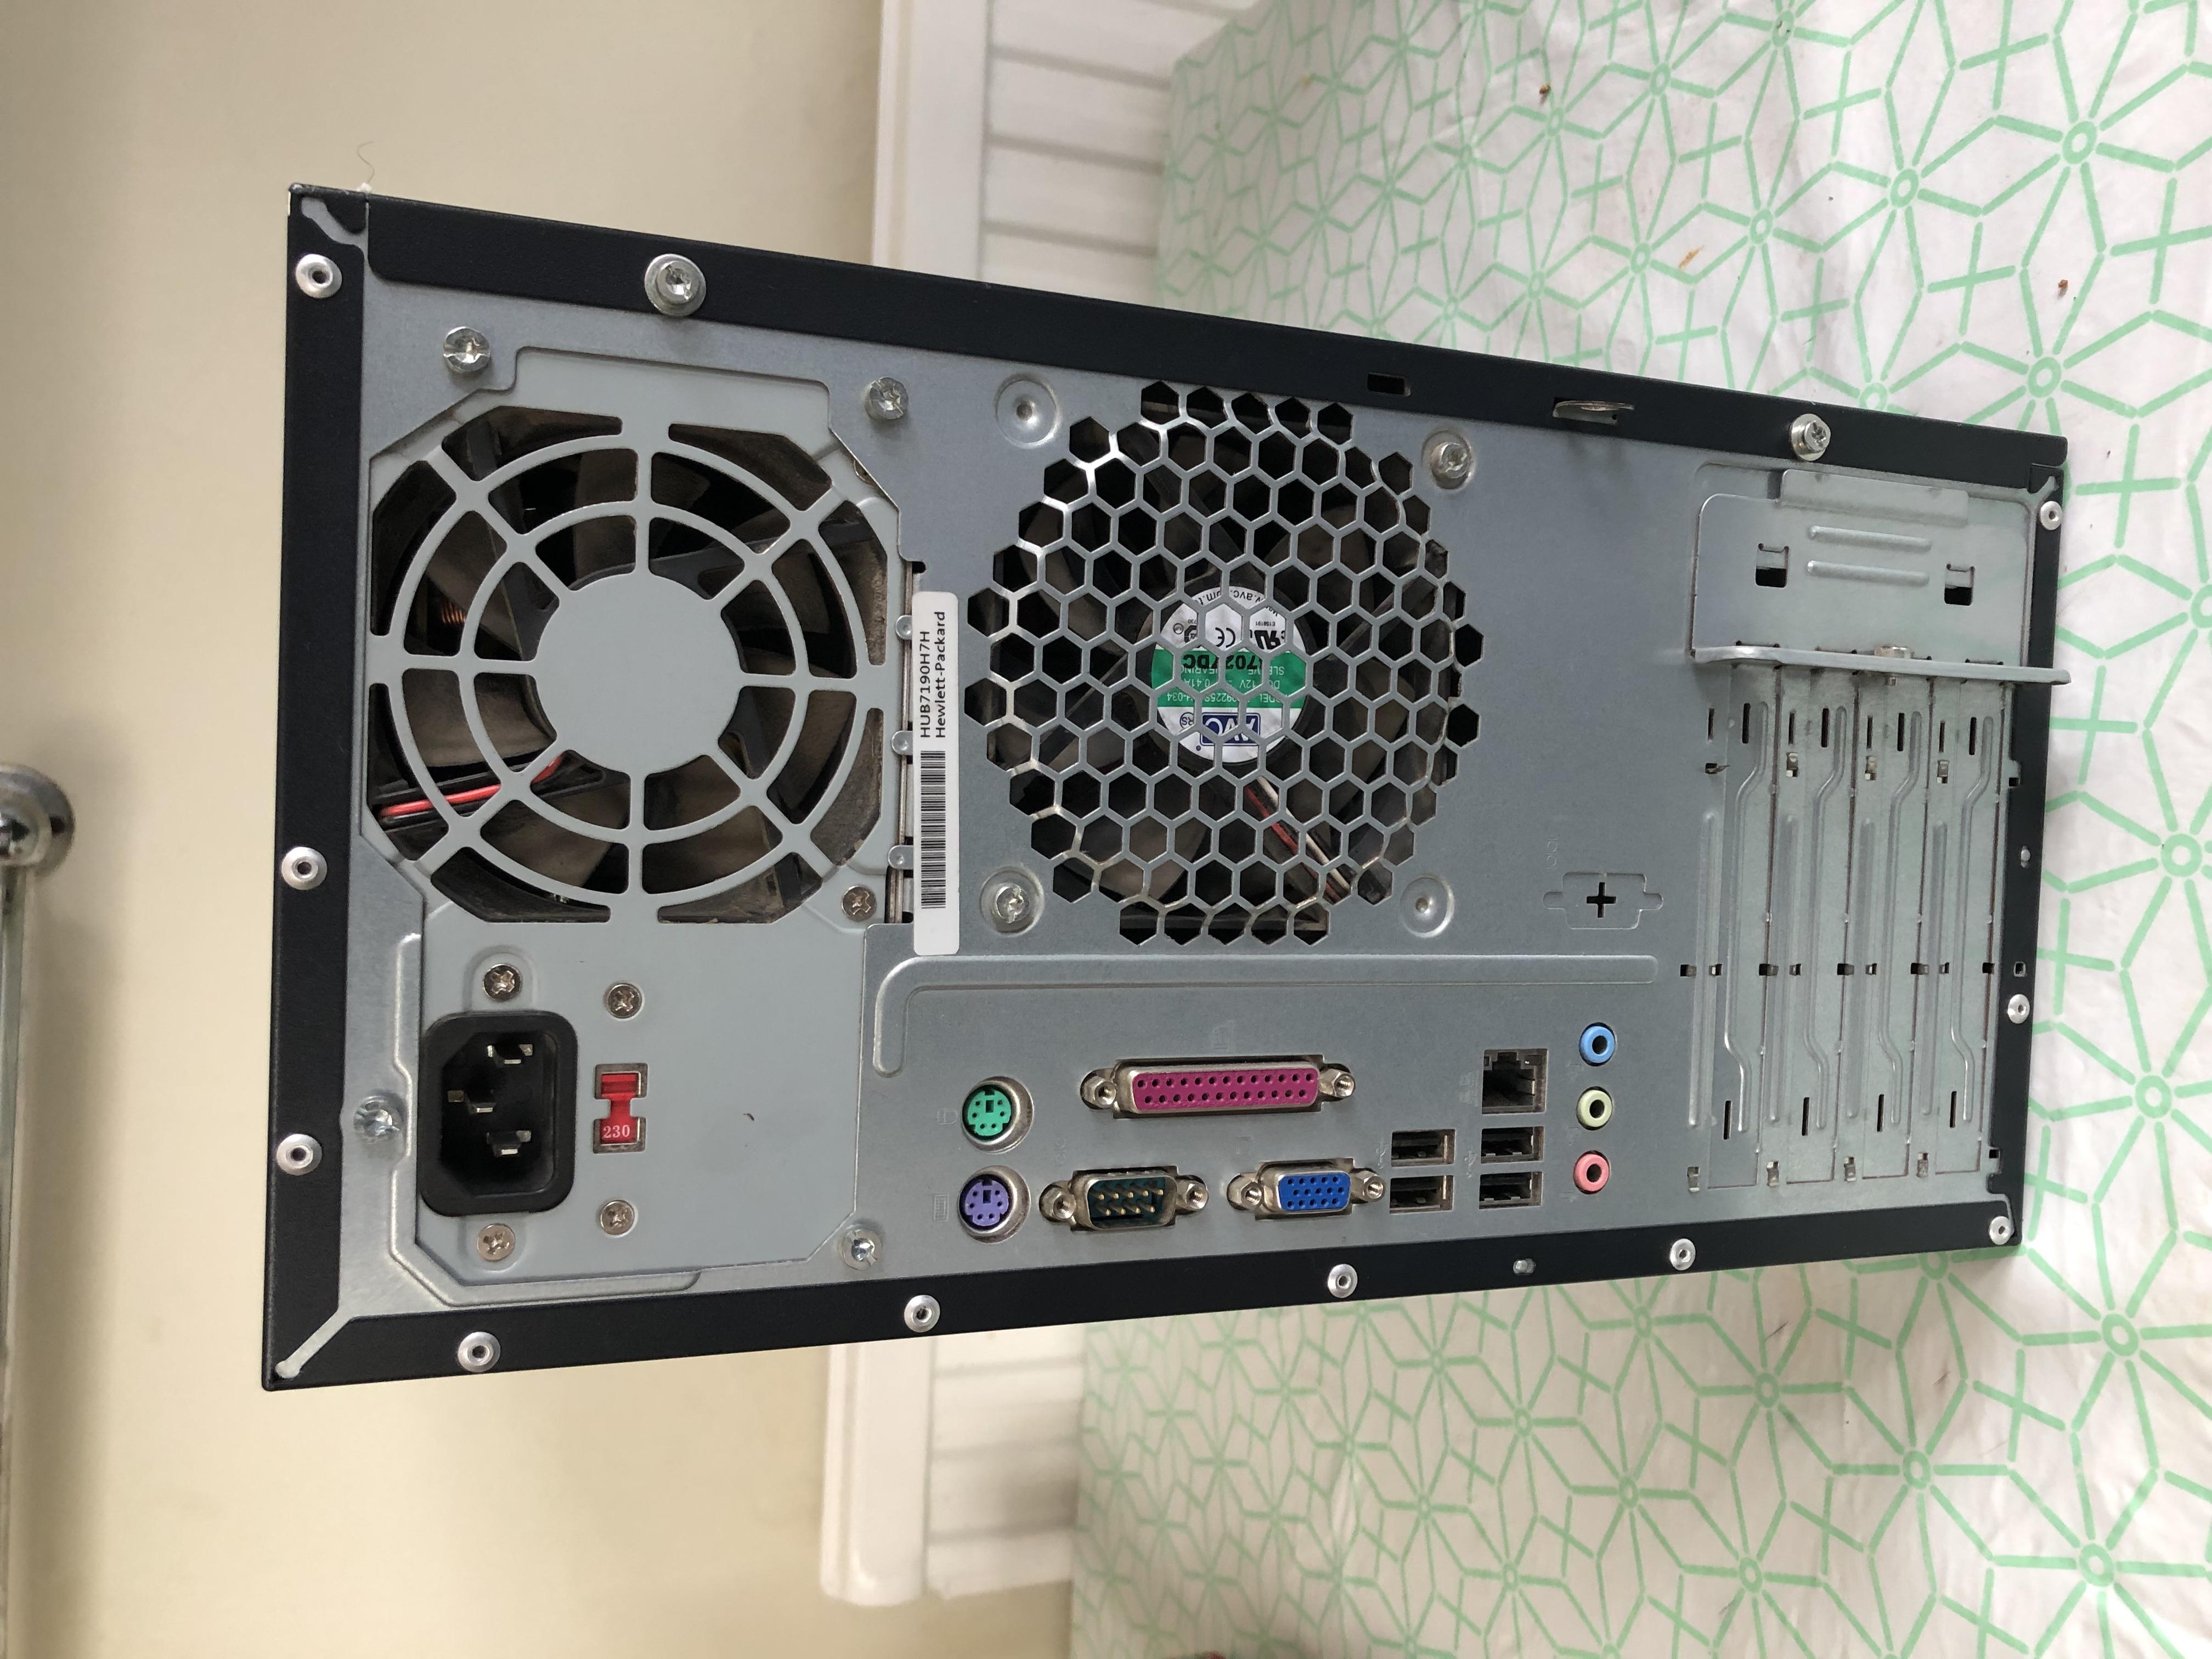 HP Compaq DX2300 Microtower, Black, Windows 10 Home